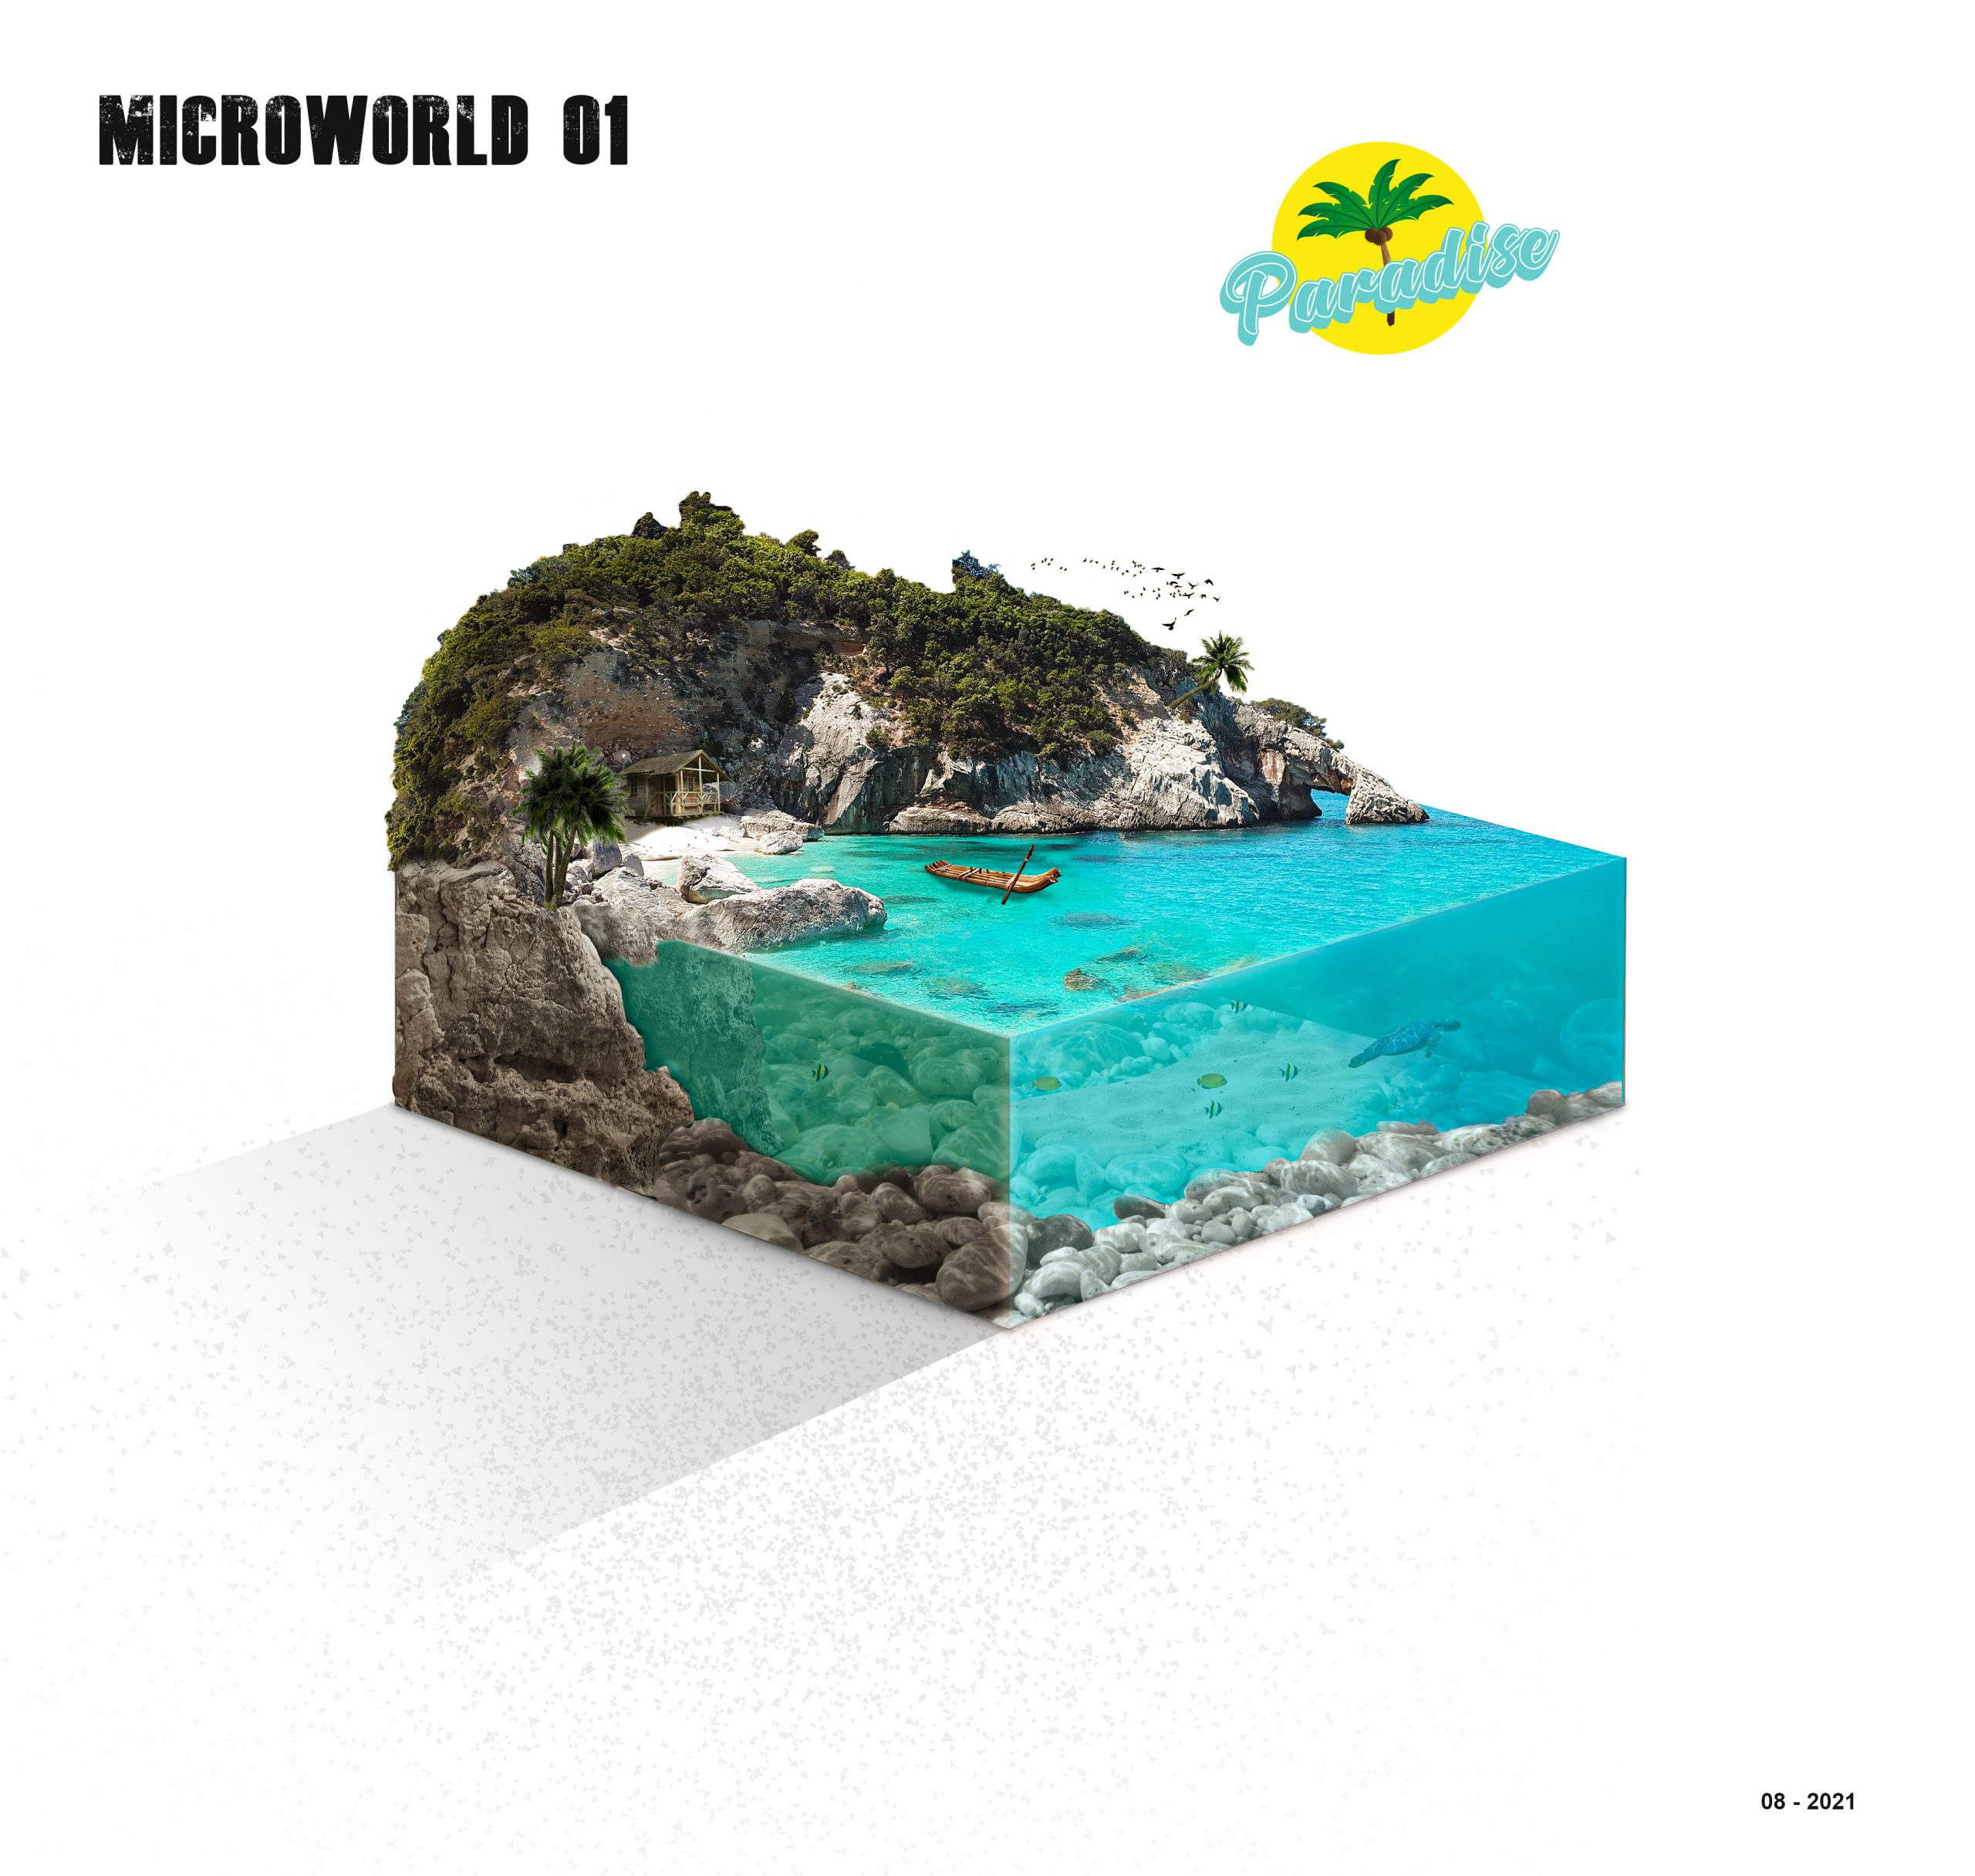 Microworld 01 – Paradise